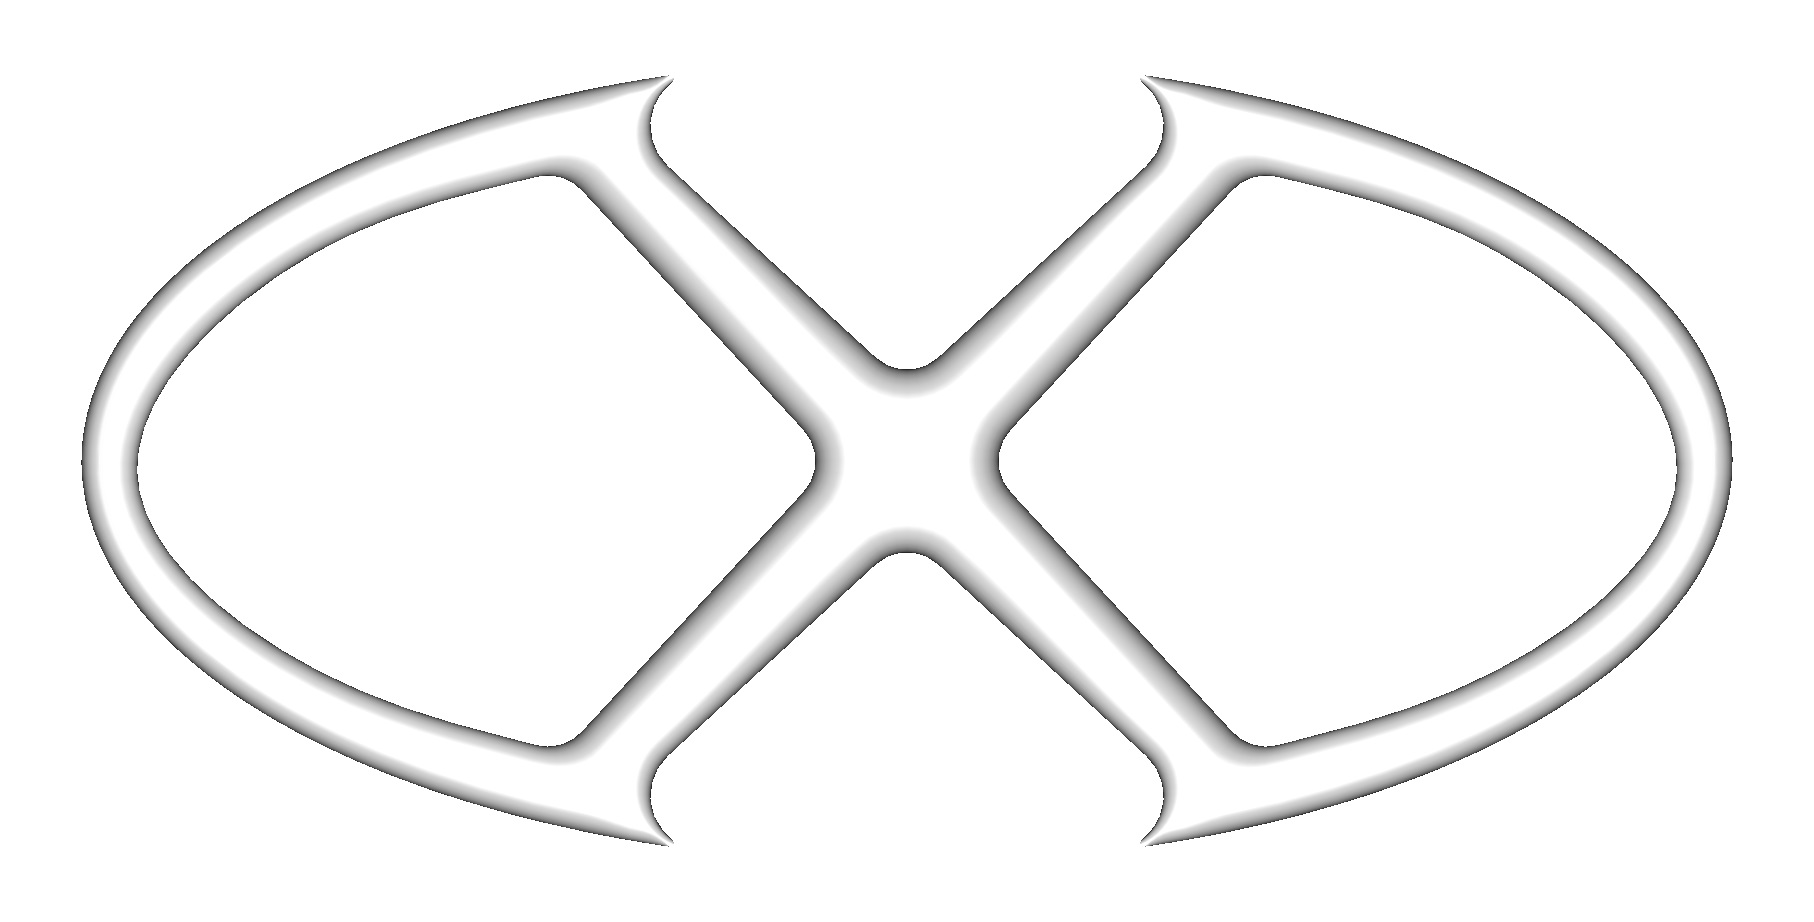 SXE10 - Rear Diff Bushings